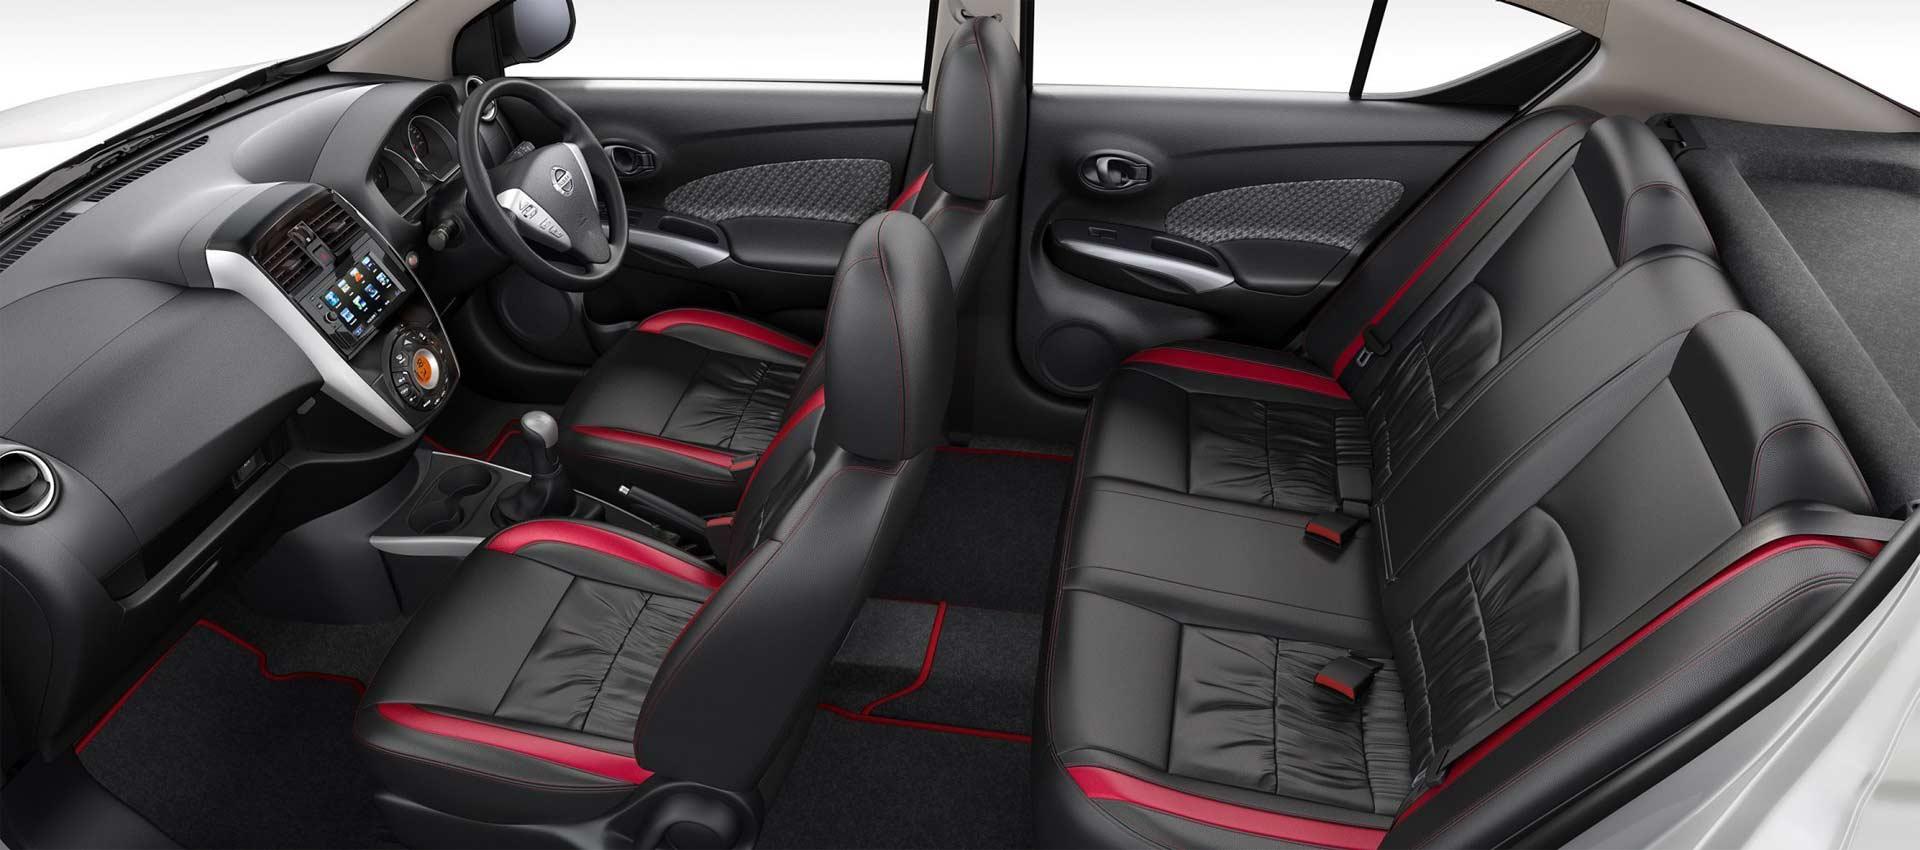 Nissan-Sunny-Special-Edition-Interior